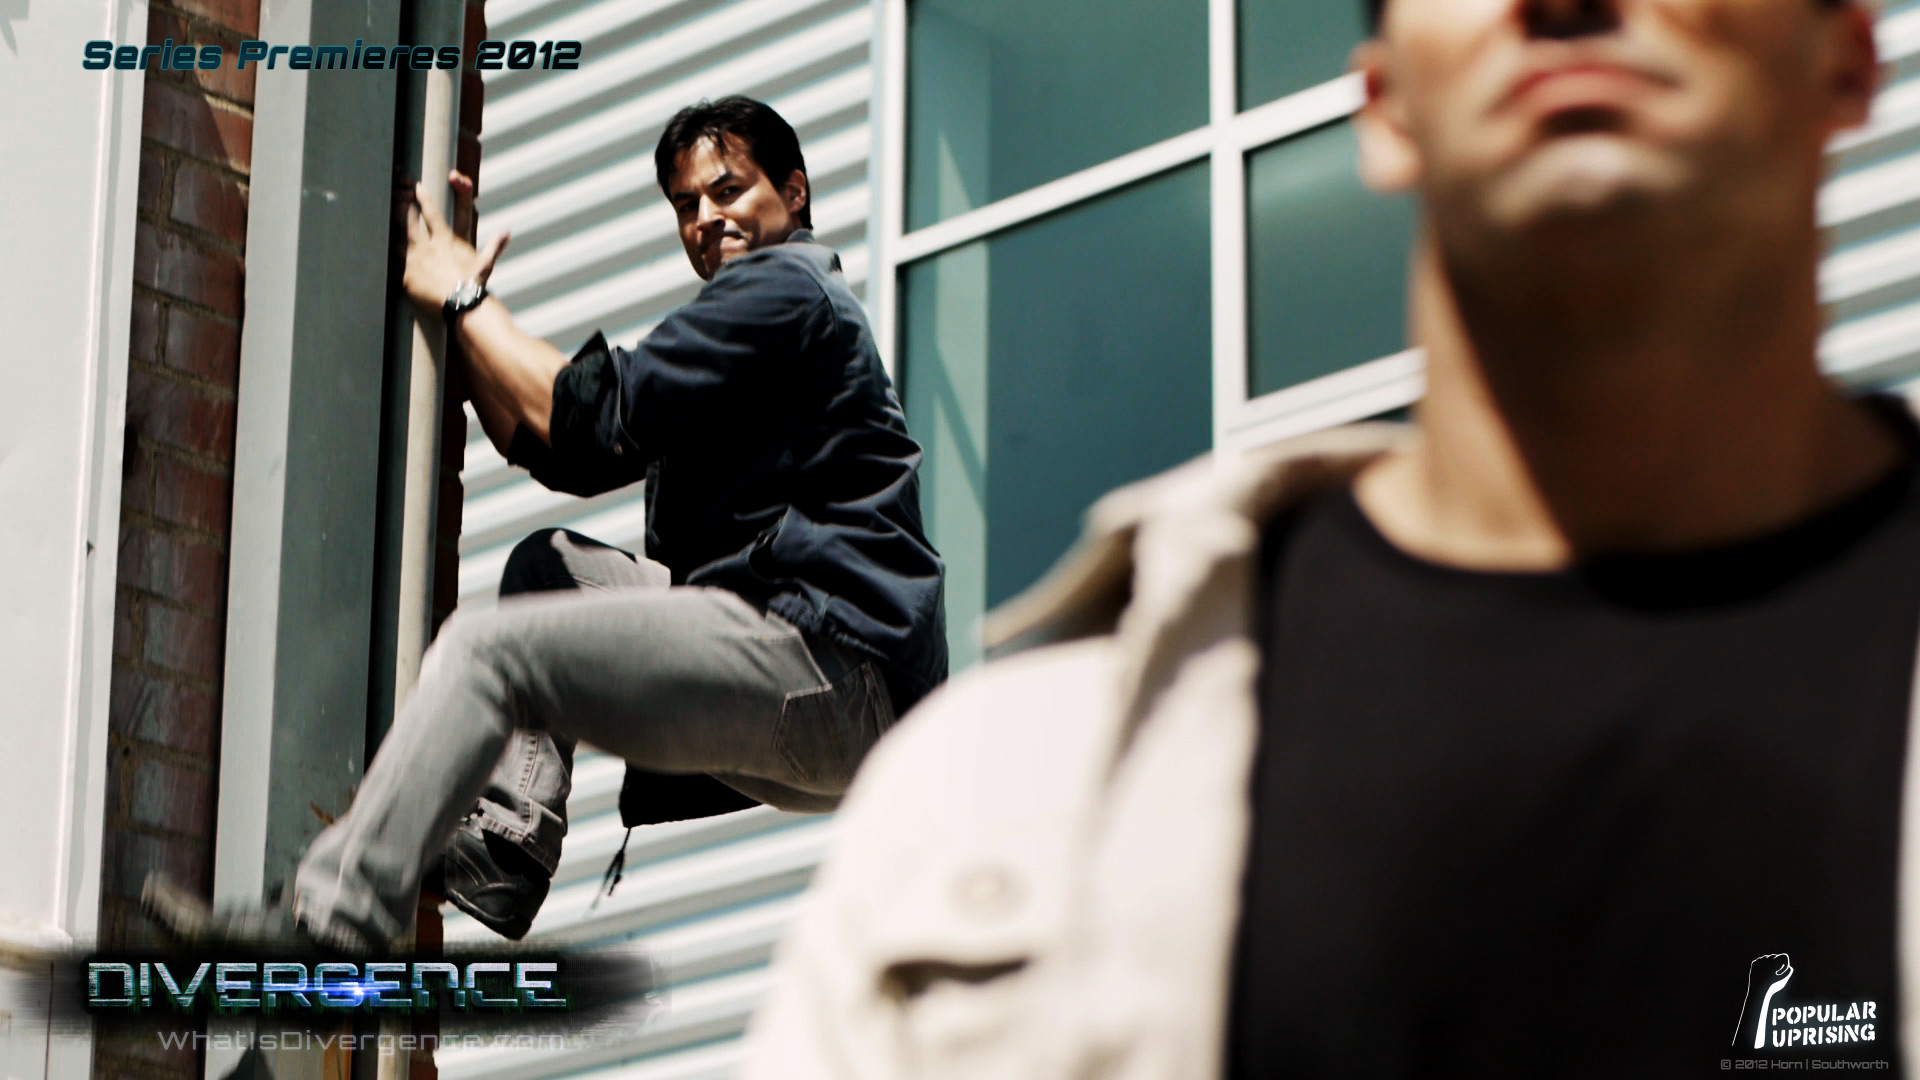 مؤدي صوت فيرجل ( Dan Southworth ) يعمل على سلسلة Divergence DIVERGENCE_Still_DanSouthworth02